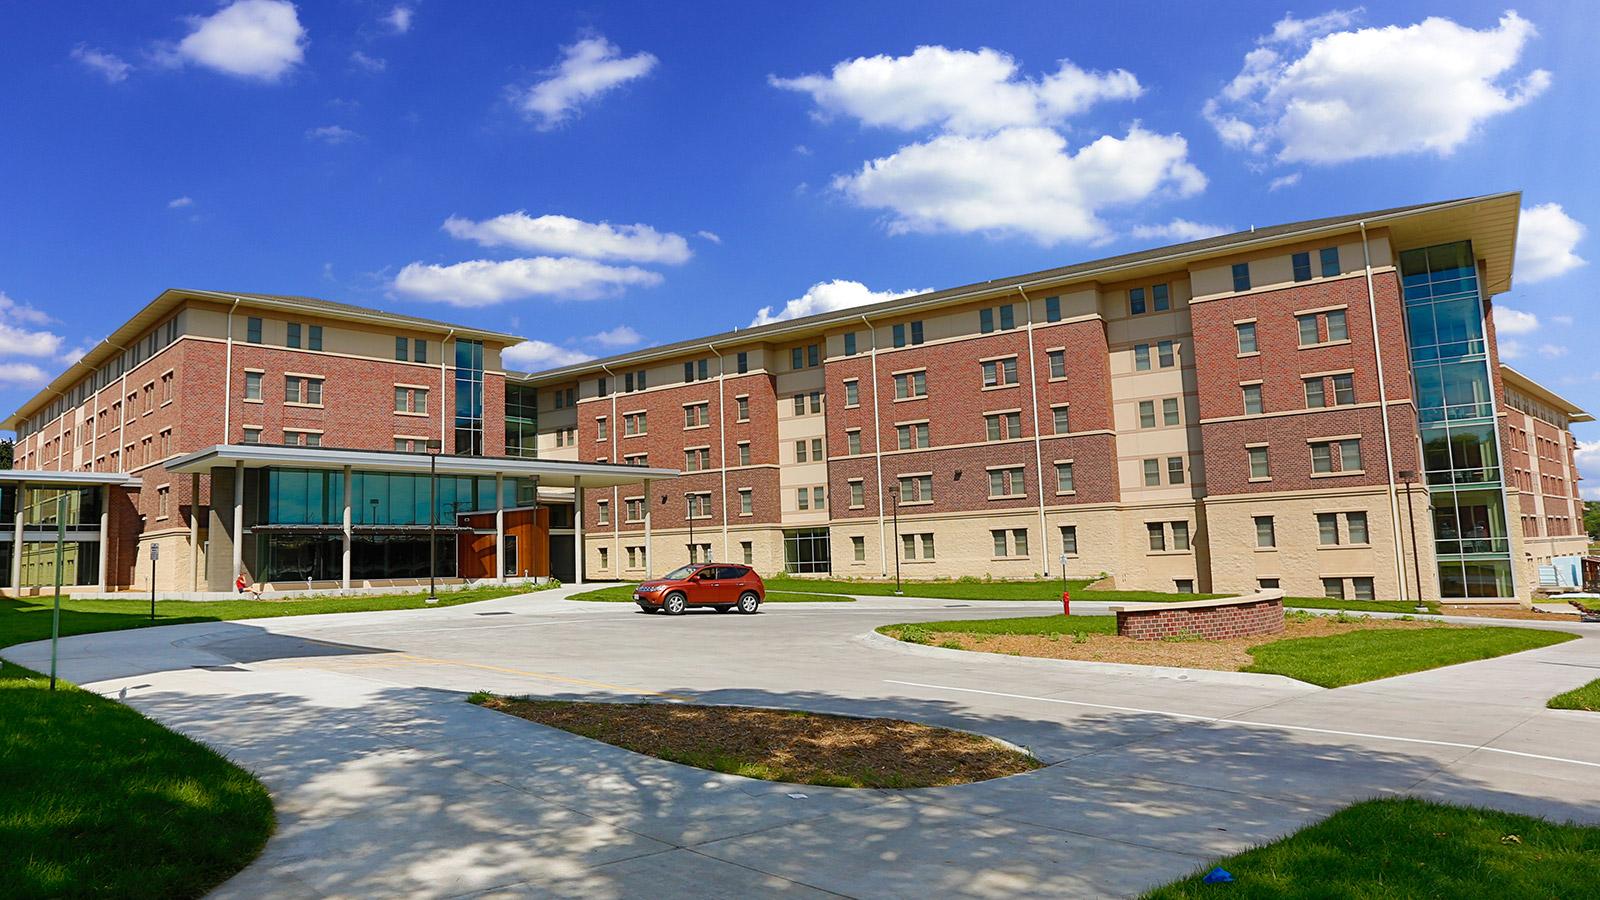 University Suites exterior of building in summer light.